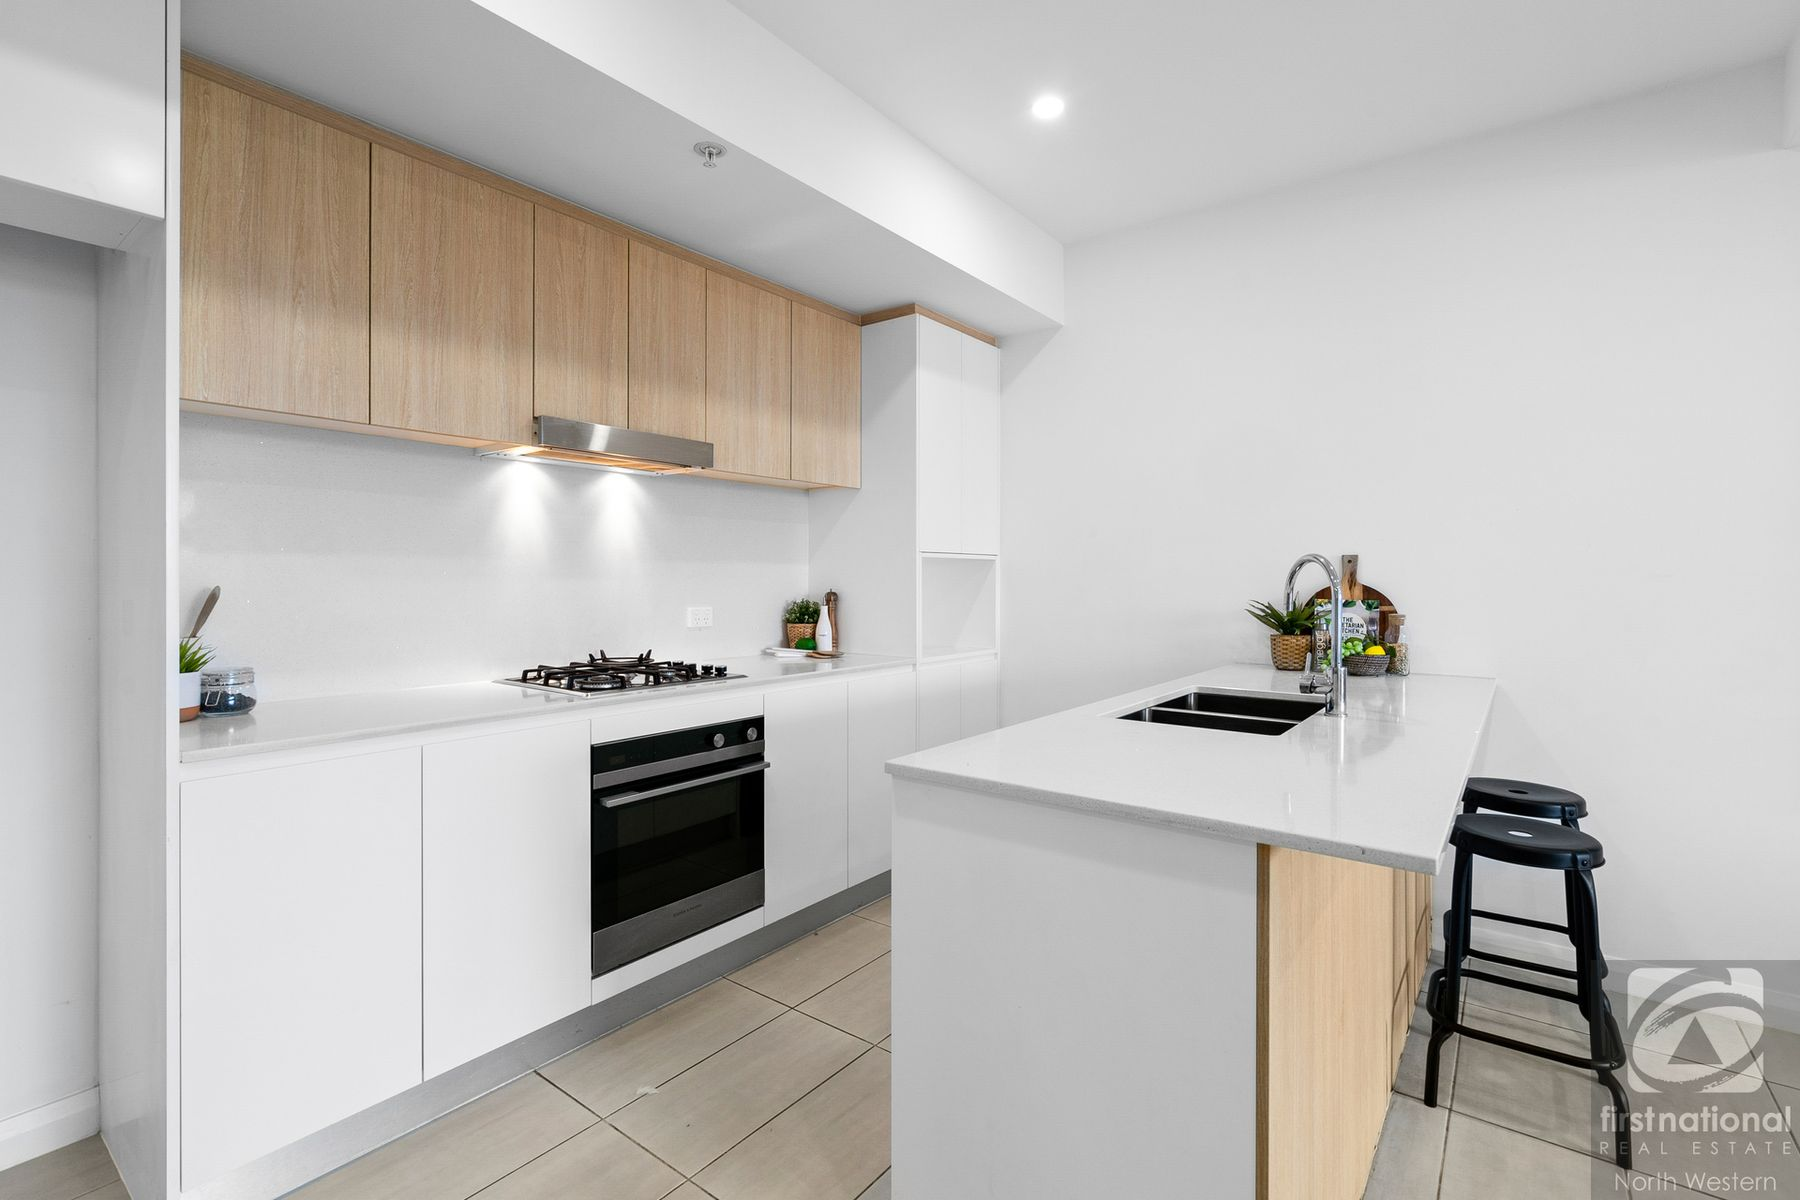 305/5 Second Avenue, Blacktown, NSW 2148